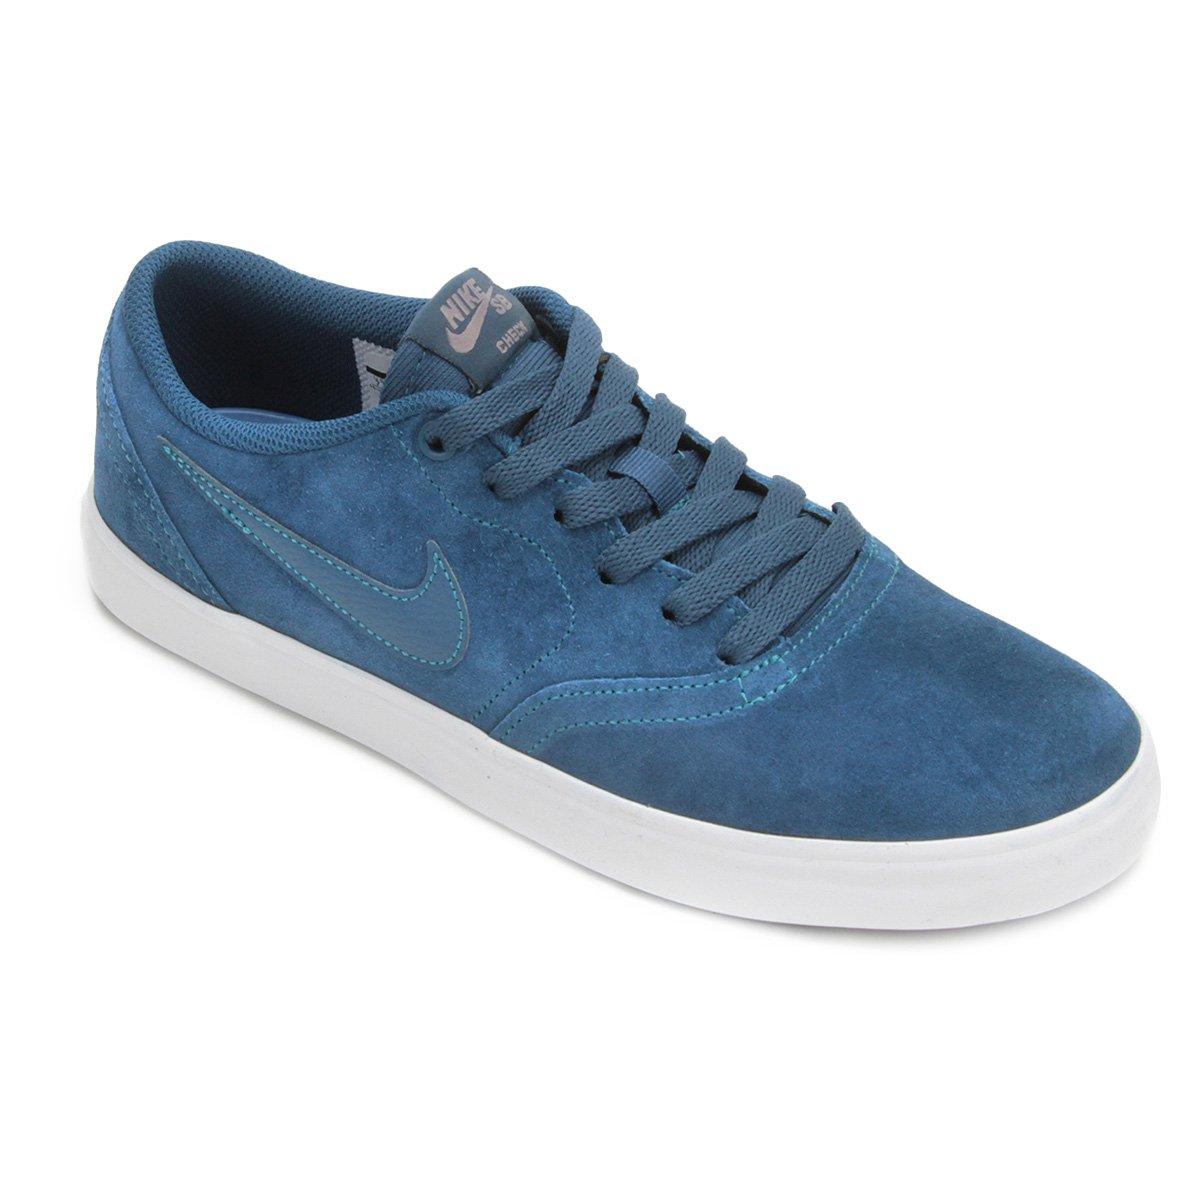 buy online 6b3d4 f151d Tênis Nike Sb Check Solar Masculino - Azul - Compre Agora   Shop Timão